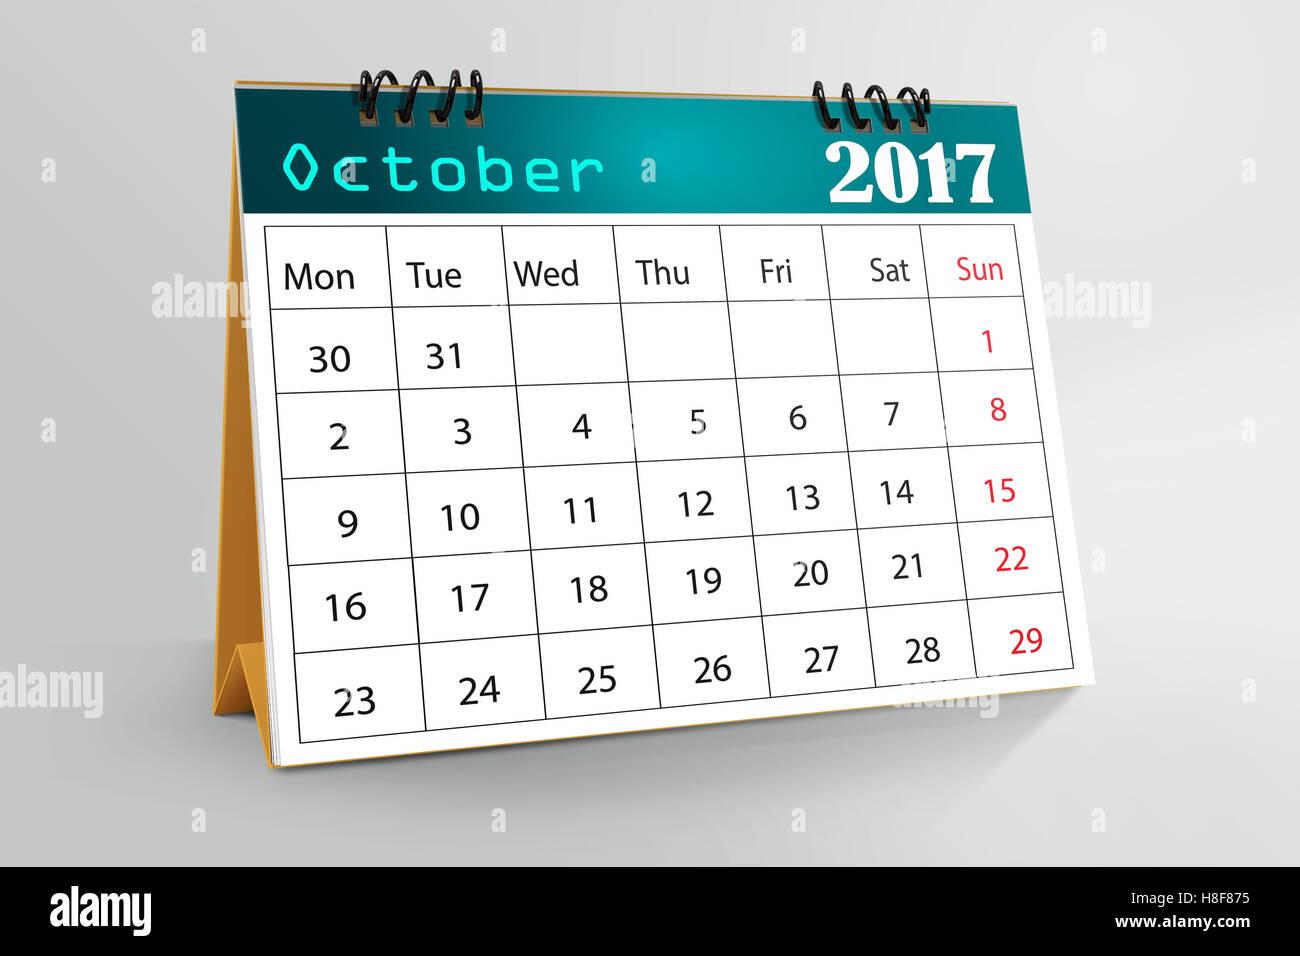 October Calendar Design : Desktop calendar design october stock photo royalty